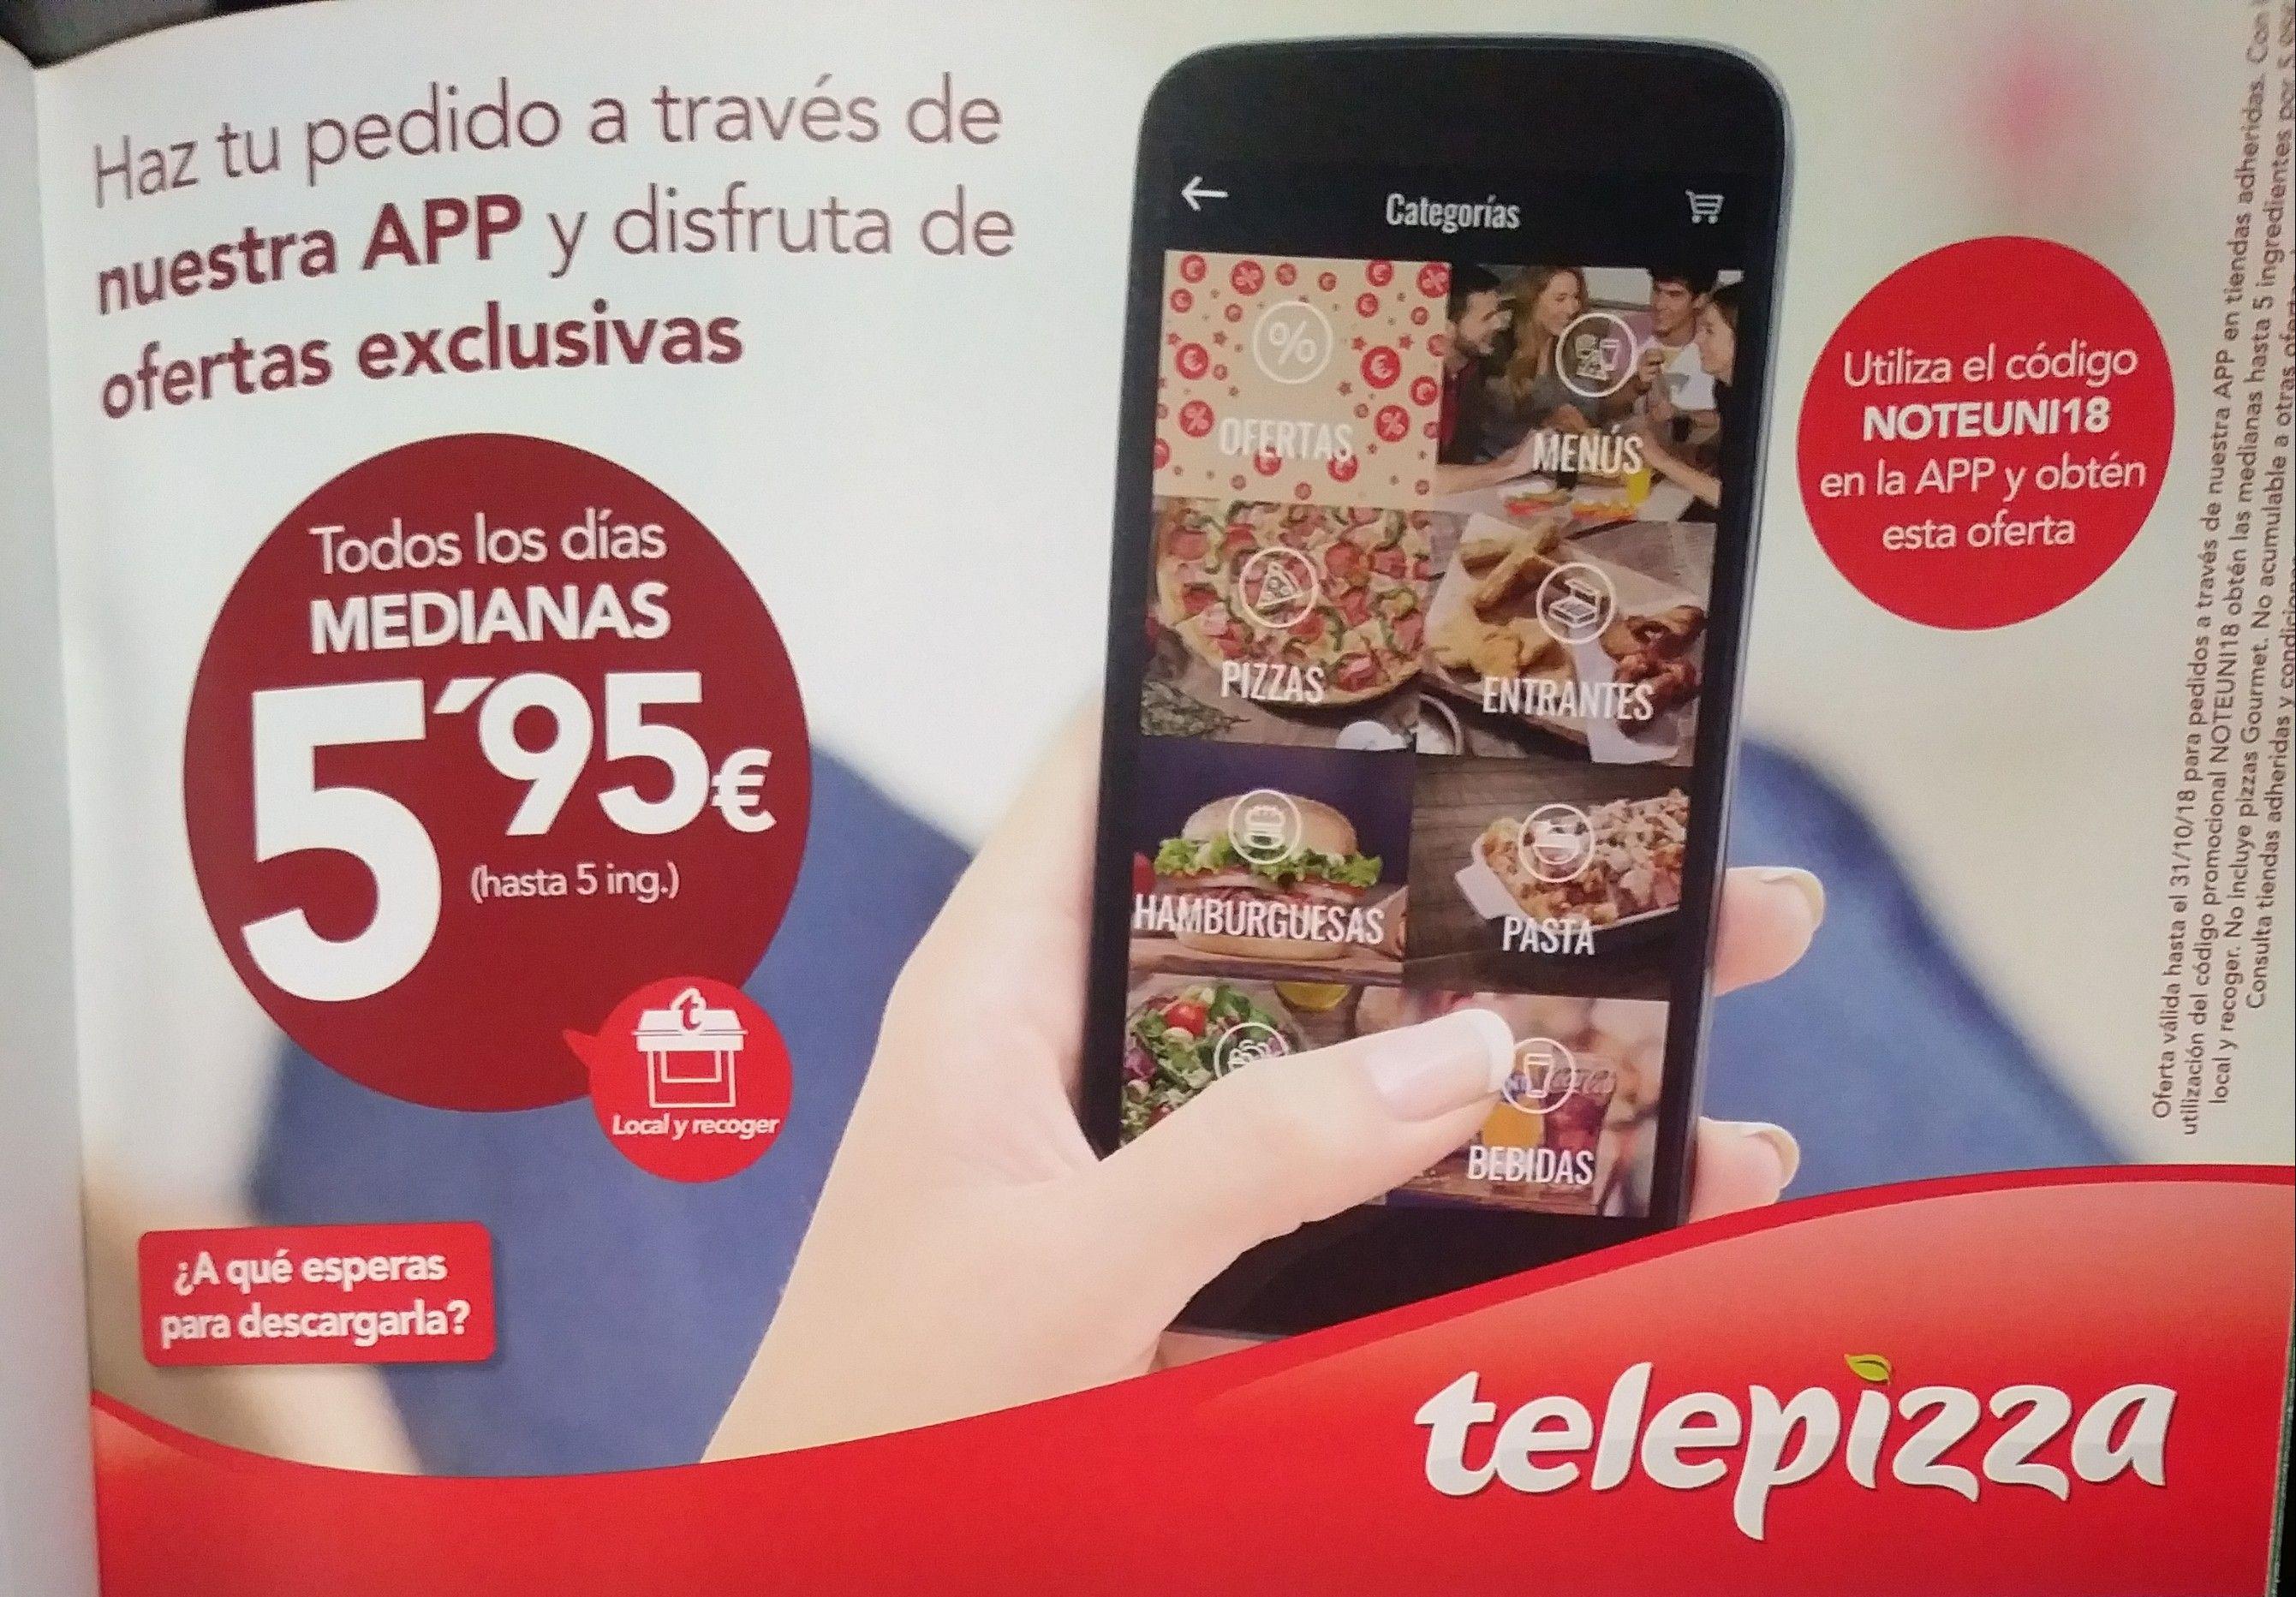 Telepizza Medianas 5.95€